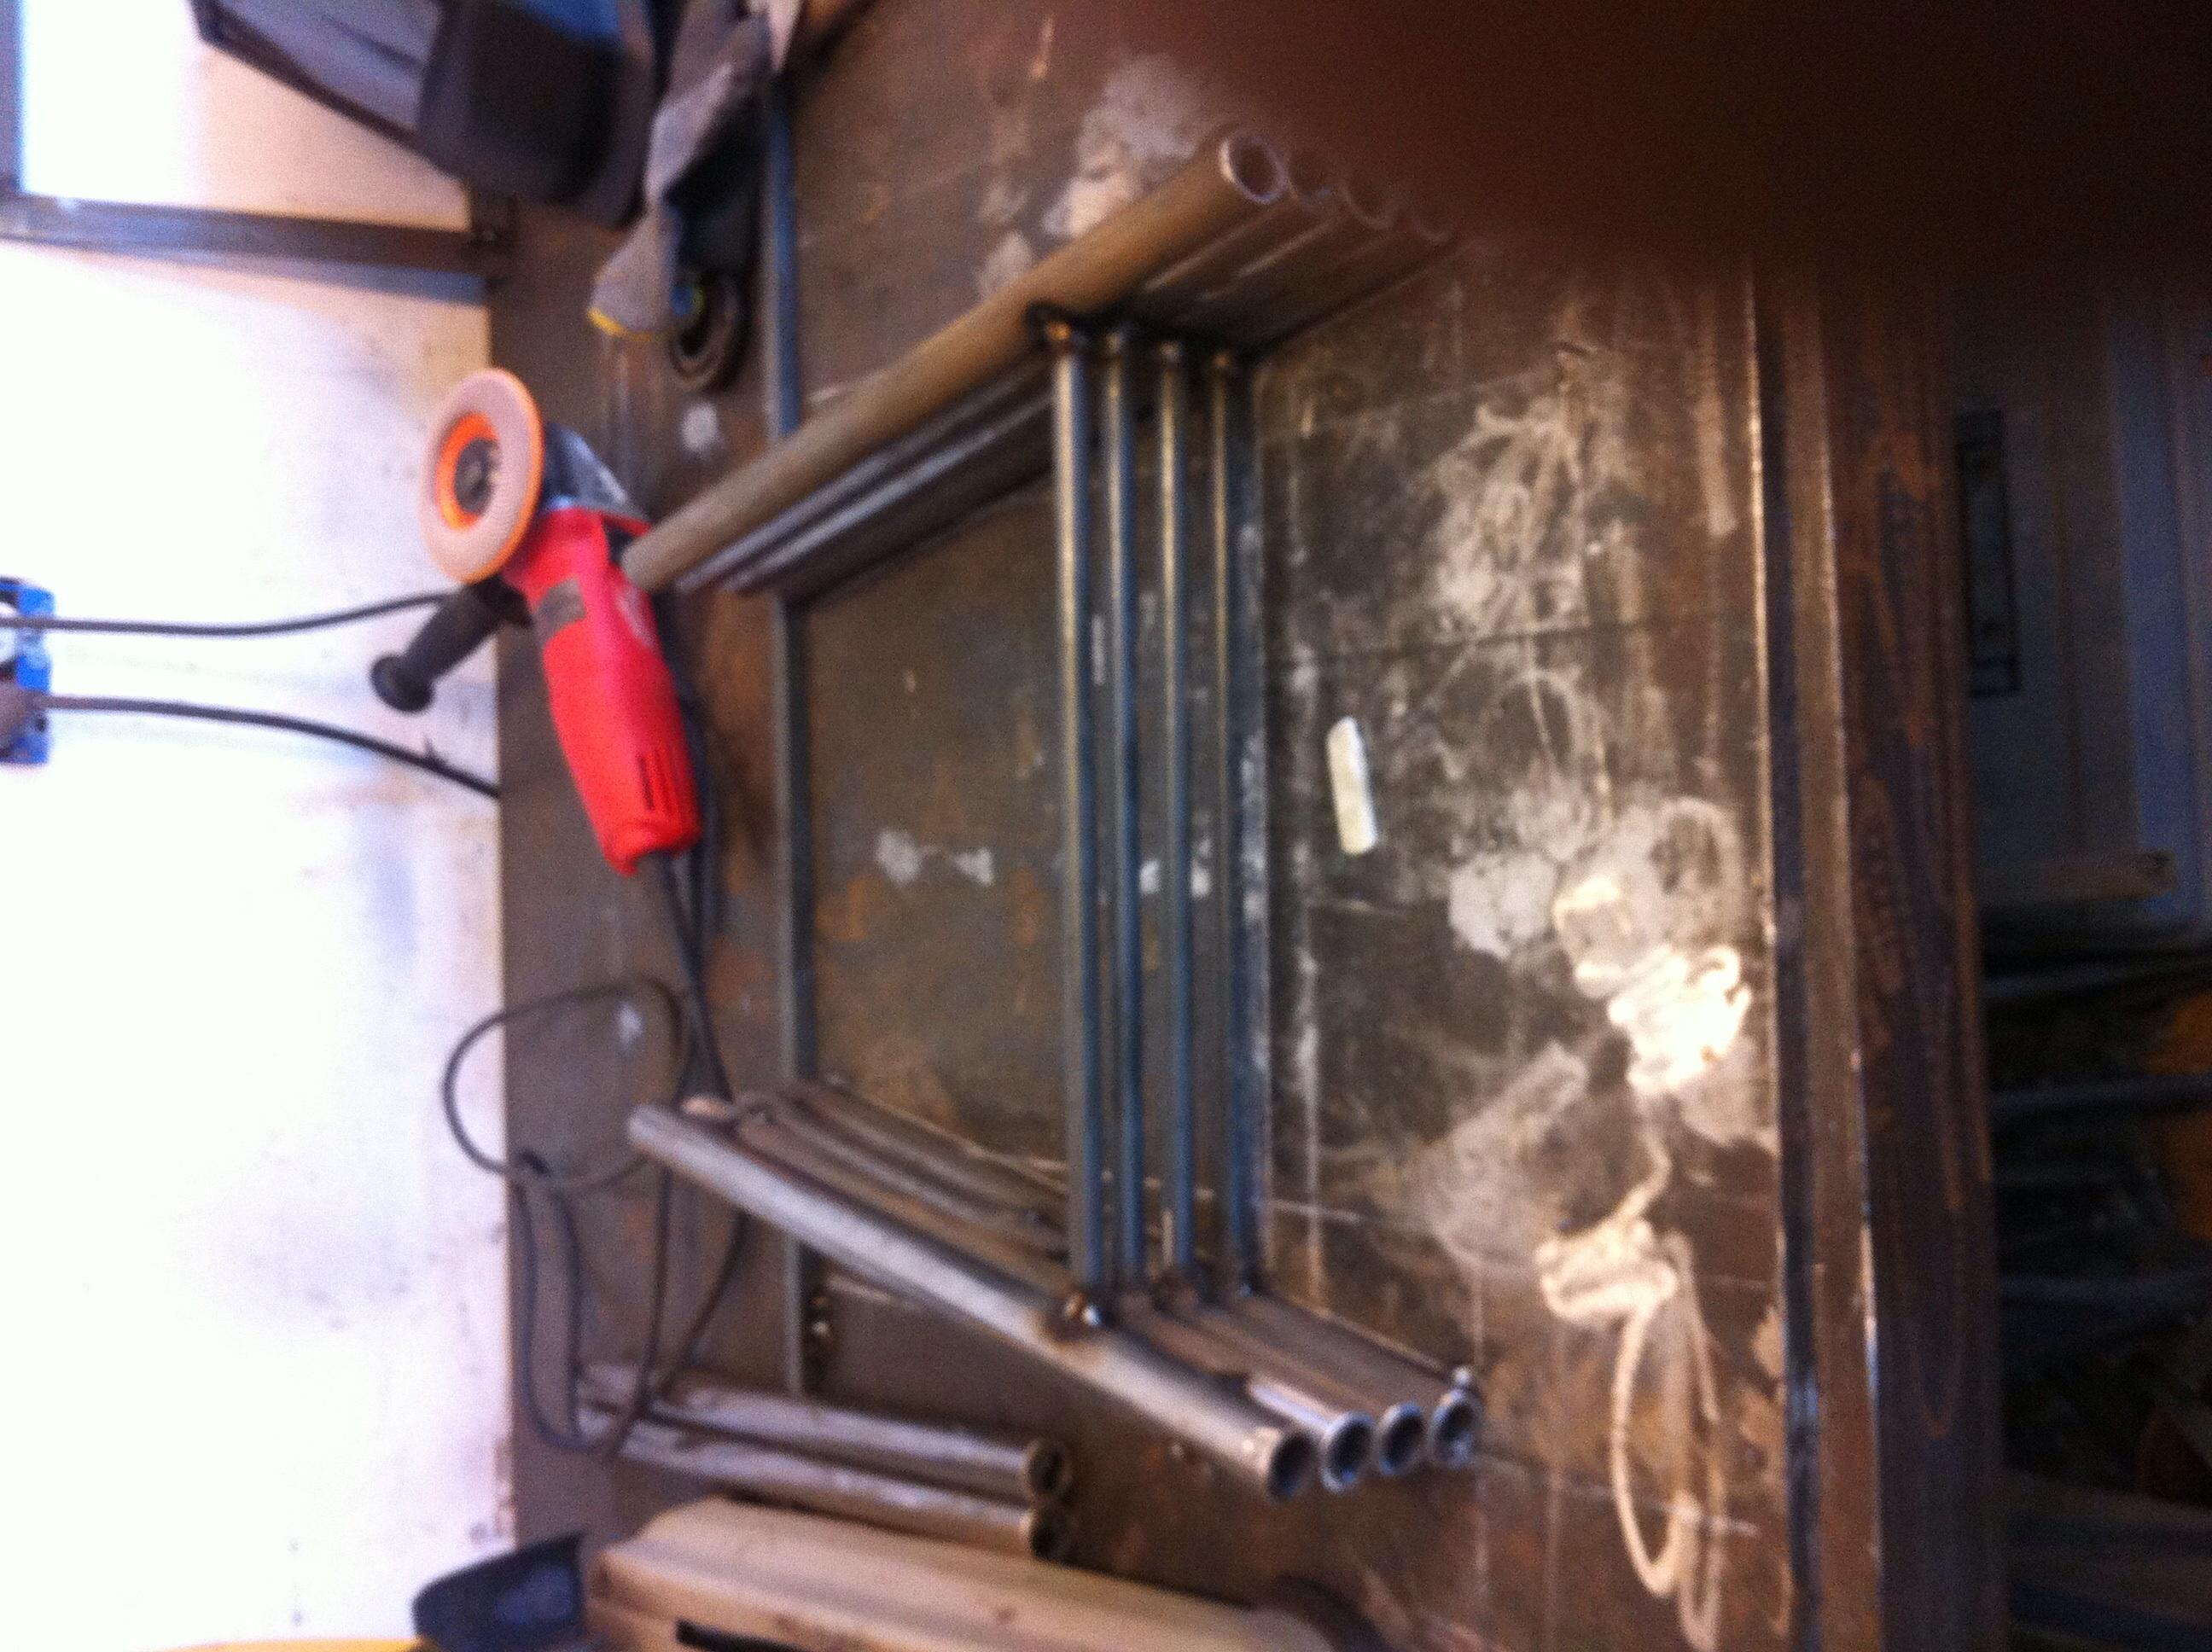 Getting my welding on...